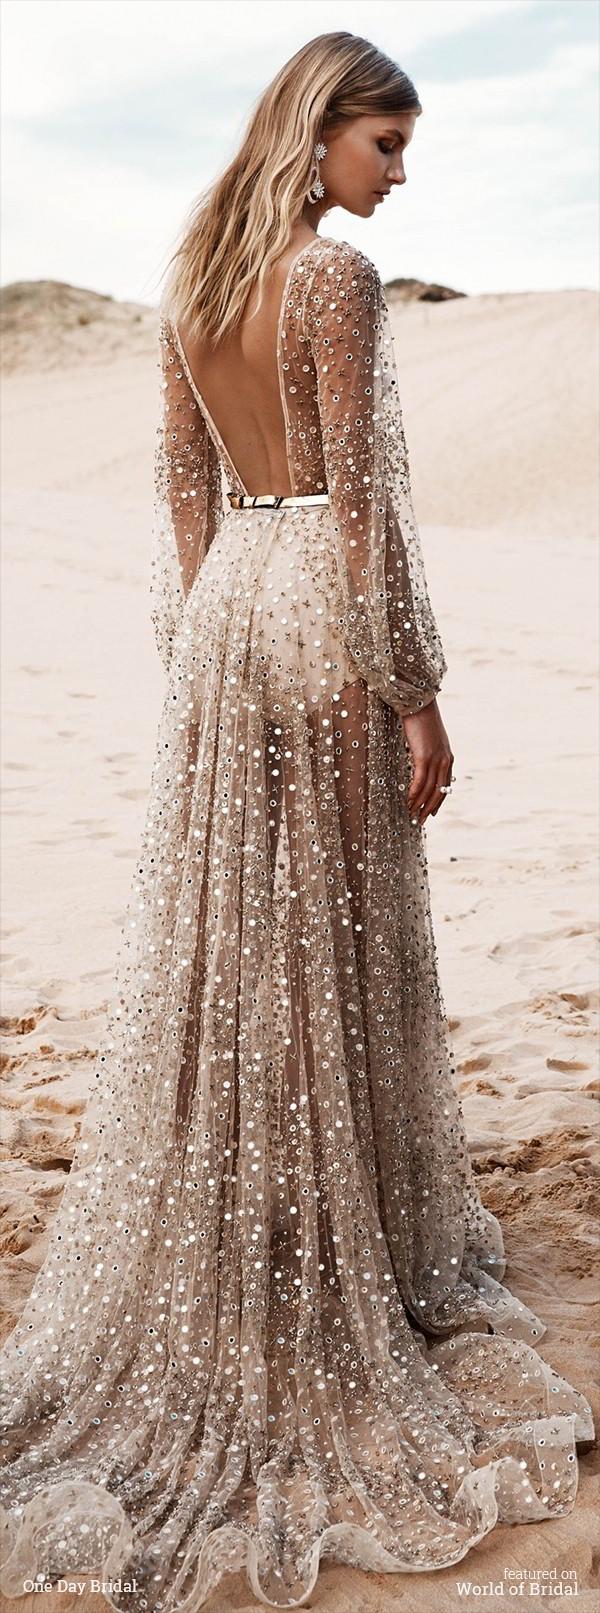 vestido de noiva, mais bonito, do mundo, desejo, perfeito, perfeito